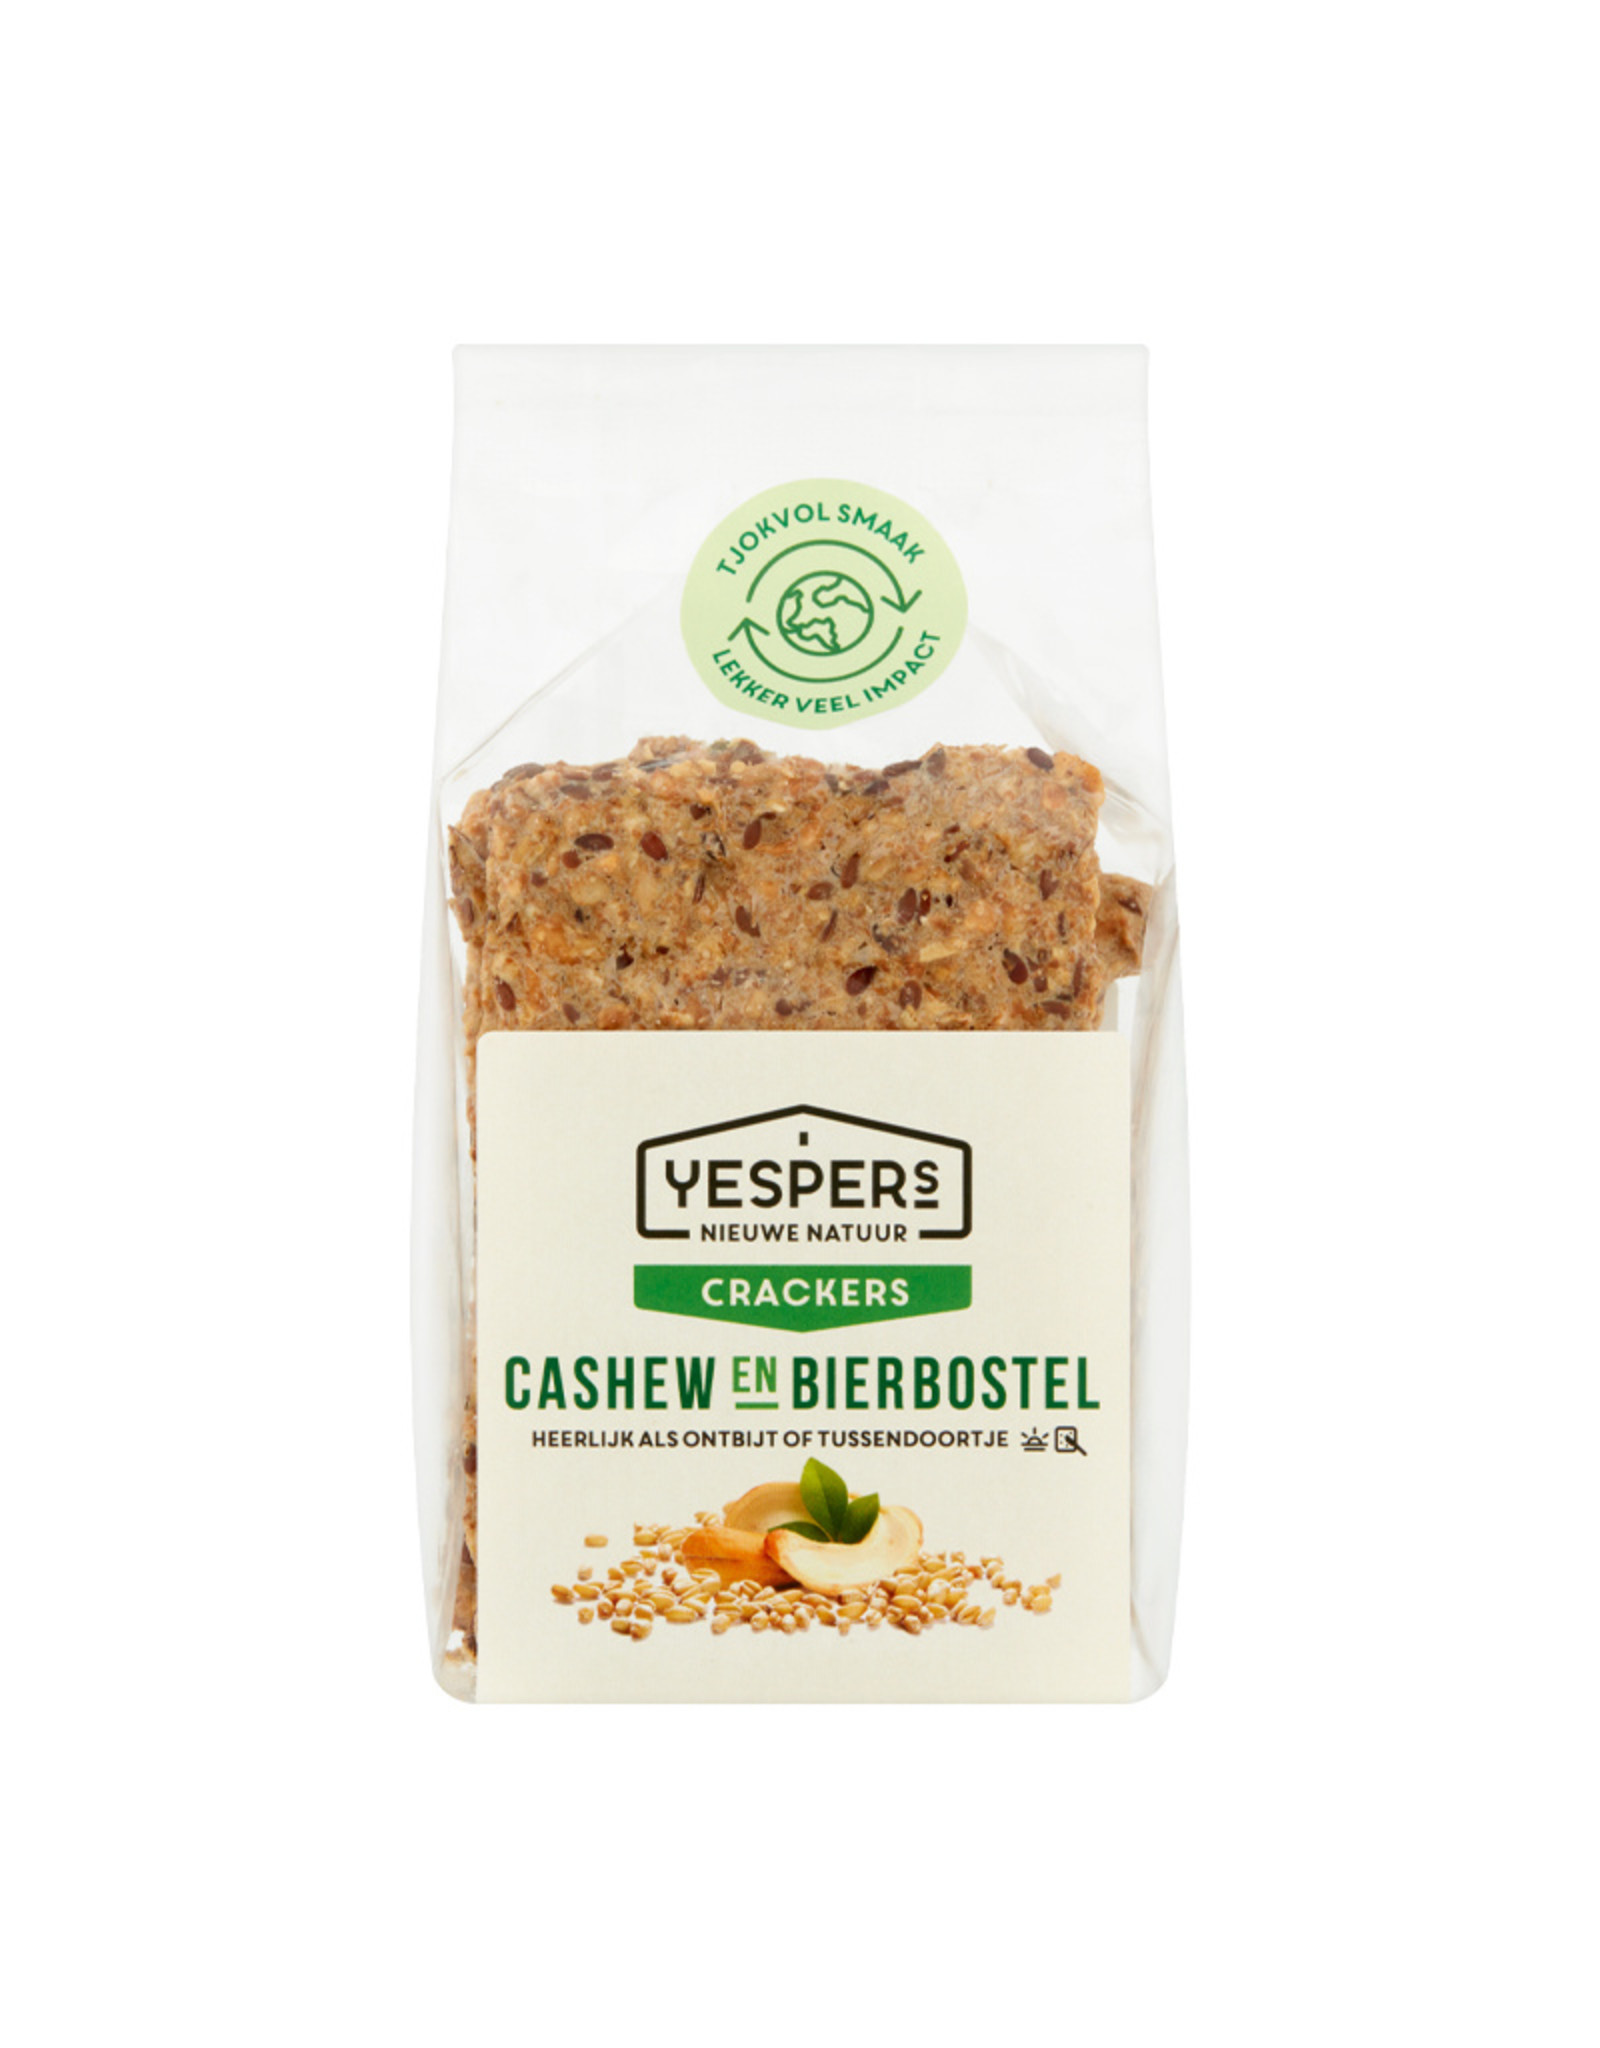 Yespers Yespers - Crackers Cashew & Bierbostel